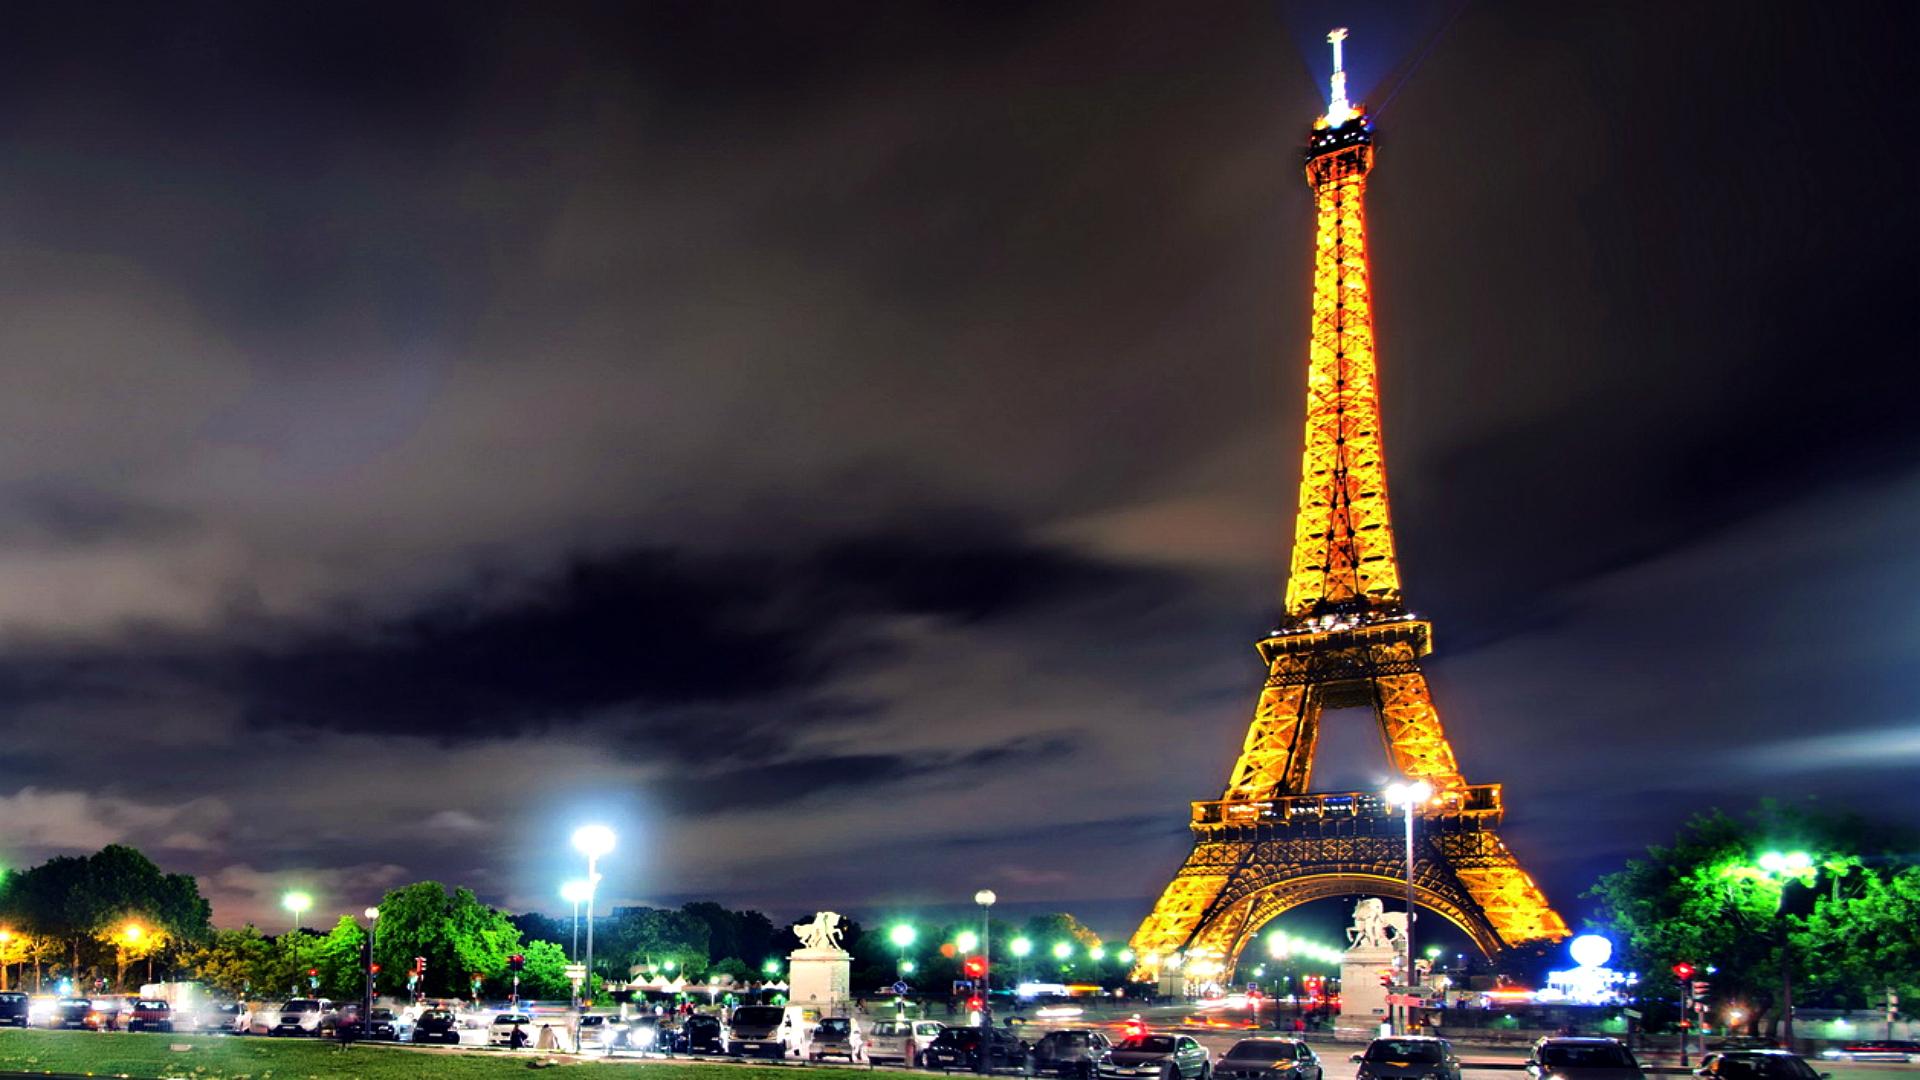 Eiffel-Tower-Best-wallpaper-wpc9004653